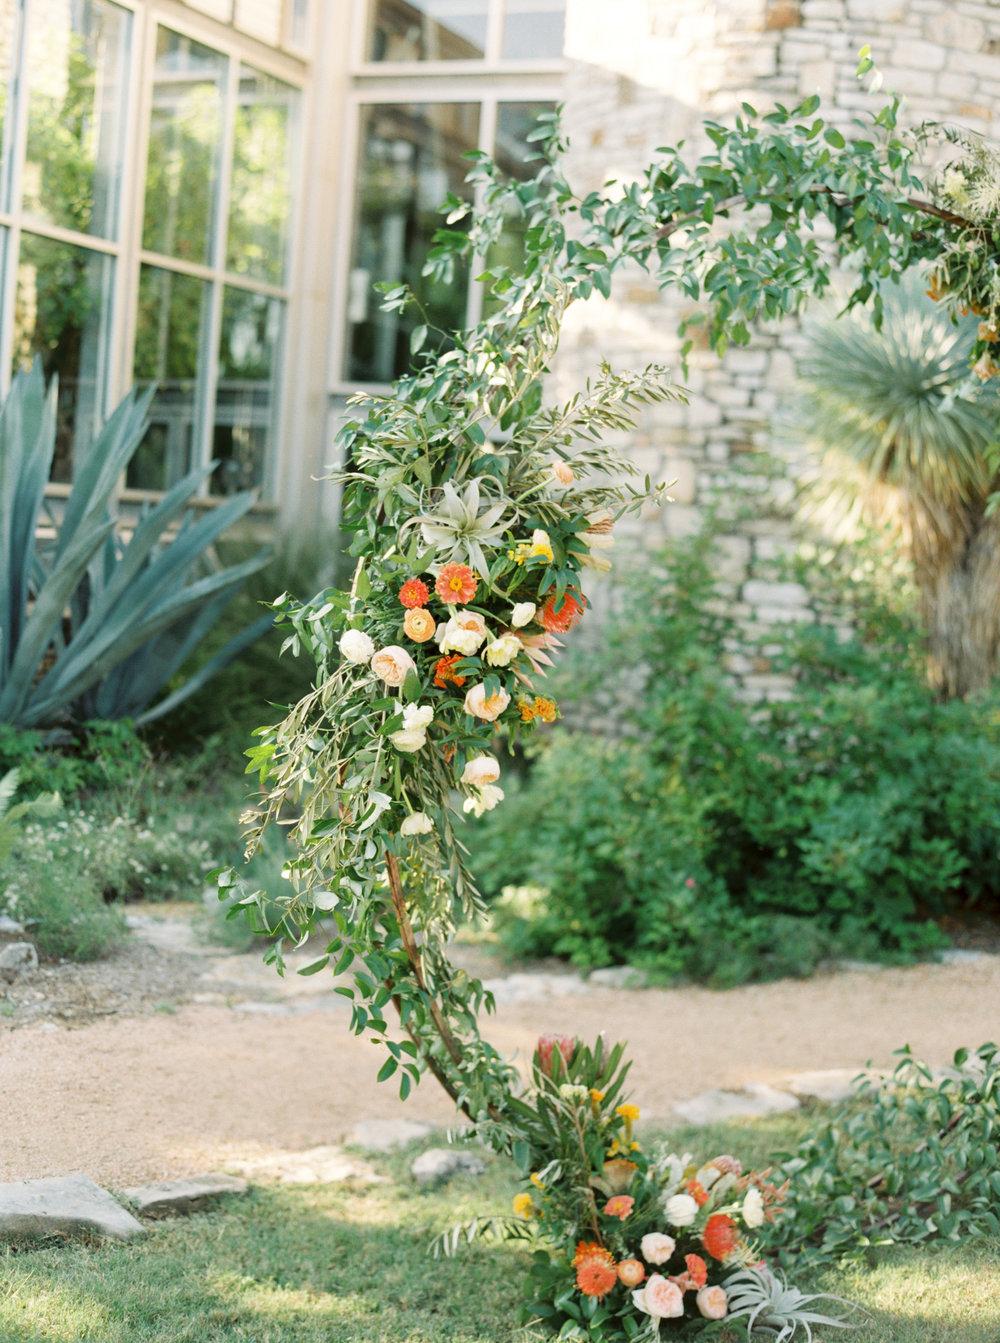 Best-Austin-Denver-California-Wedding-Photographer-Greenhouse-Driftwood9.jpg